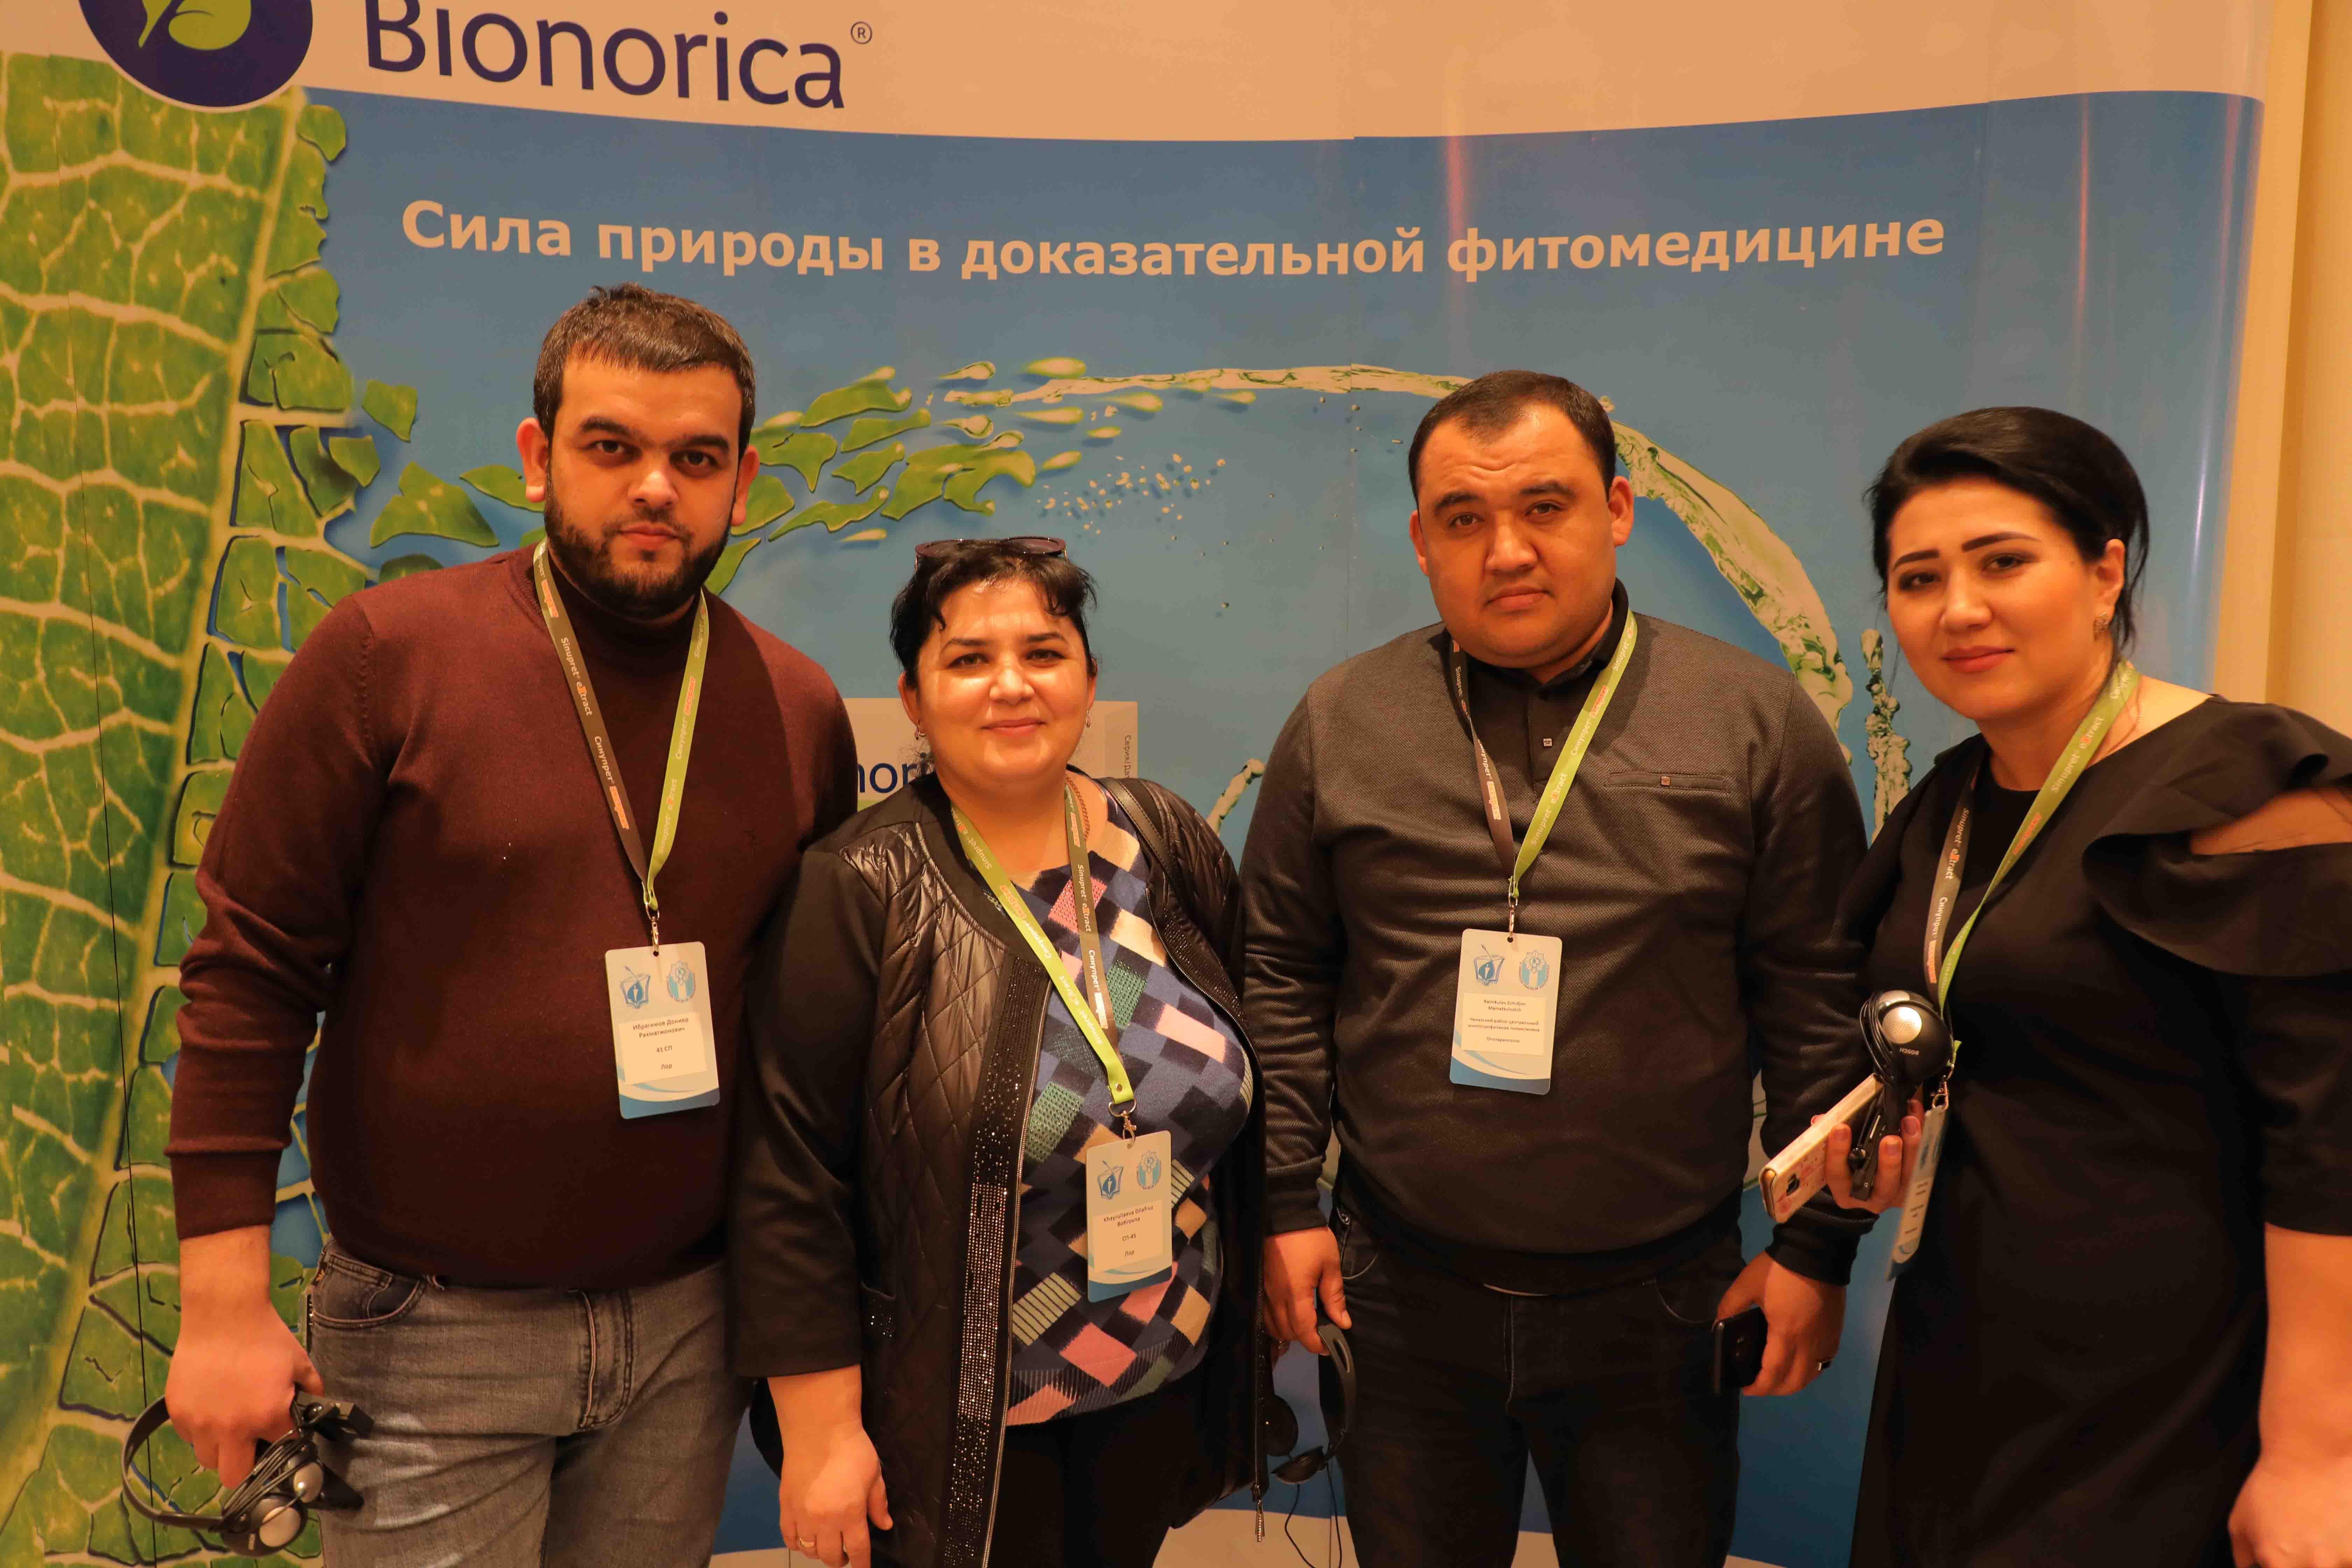 http://medicalexpress.ru/uploads/reportss/666A2857.jpg